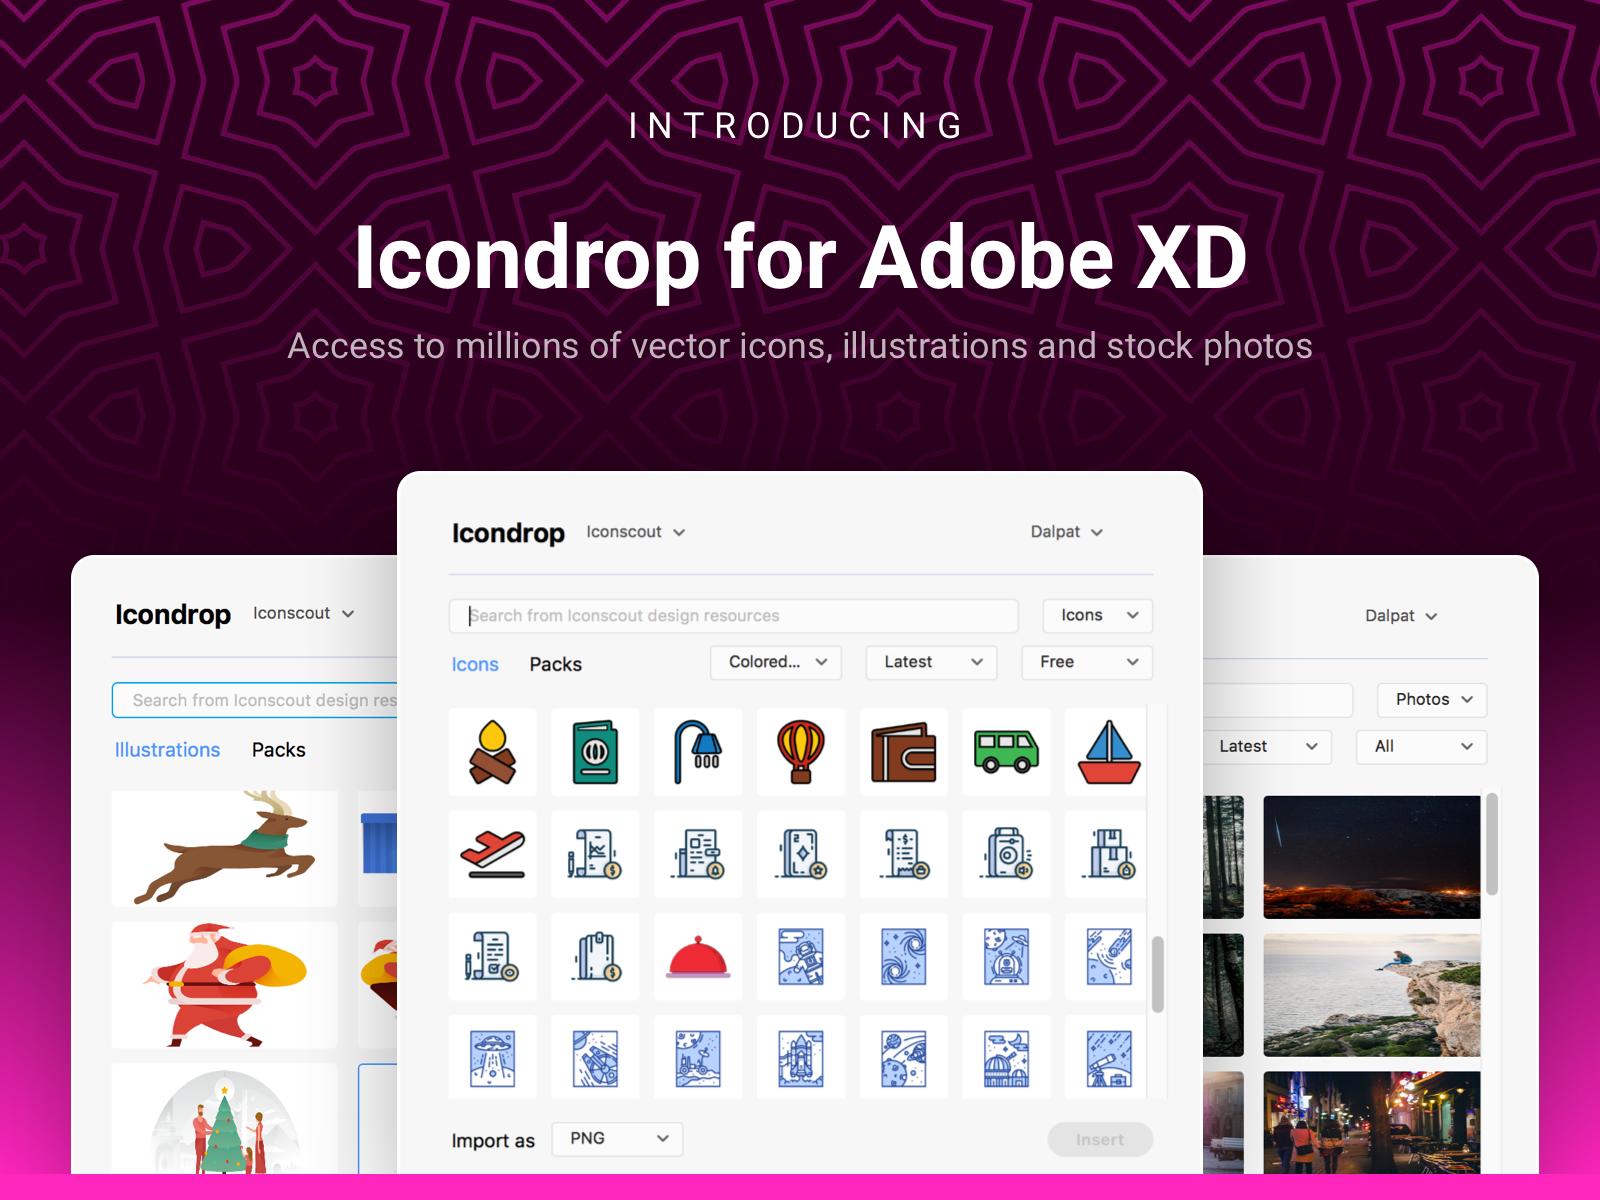 Icondrop for Adobe Xd